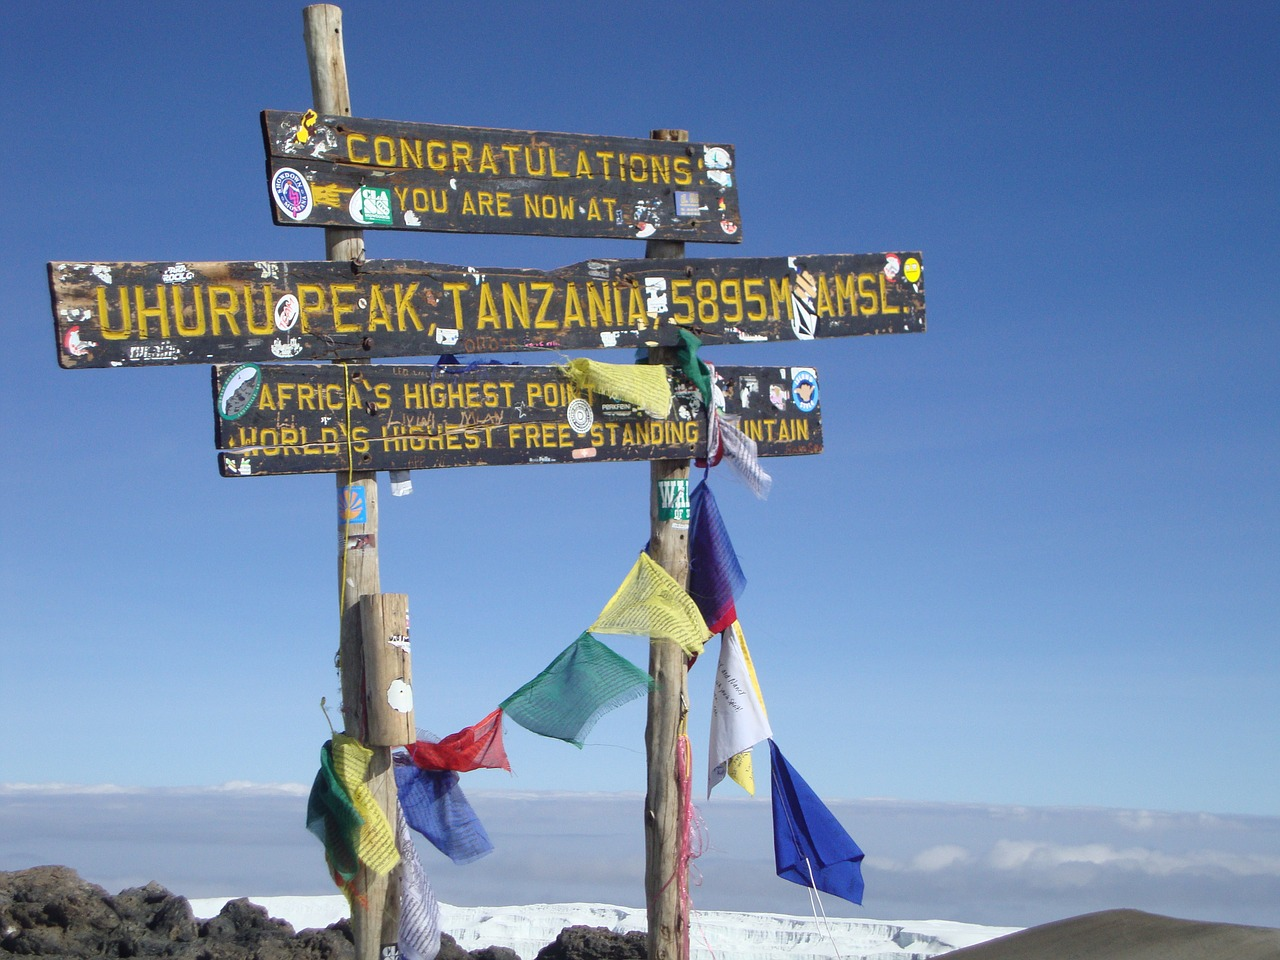 Uhuru Kilimanjaro Tanzania